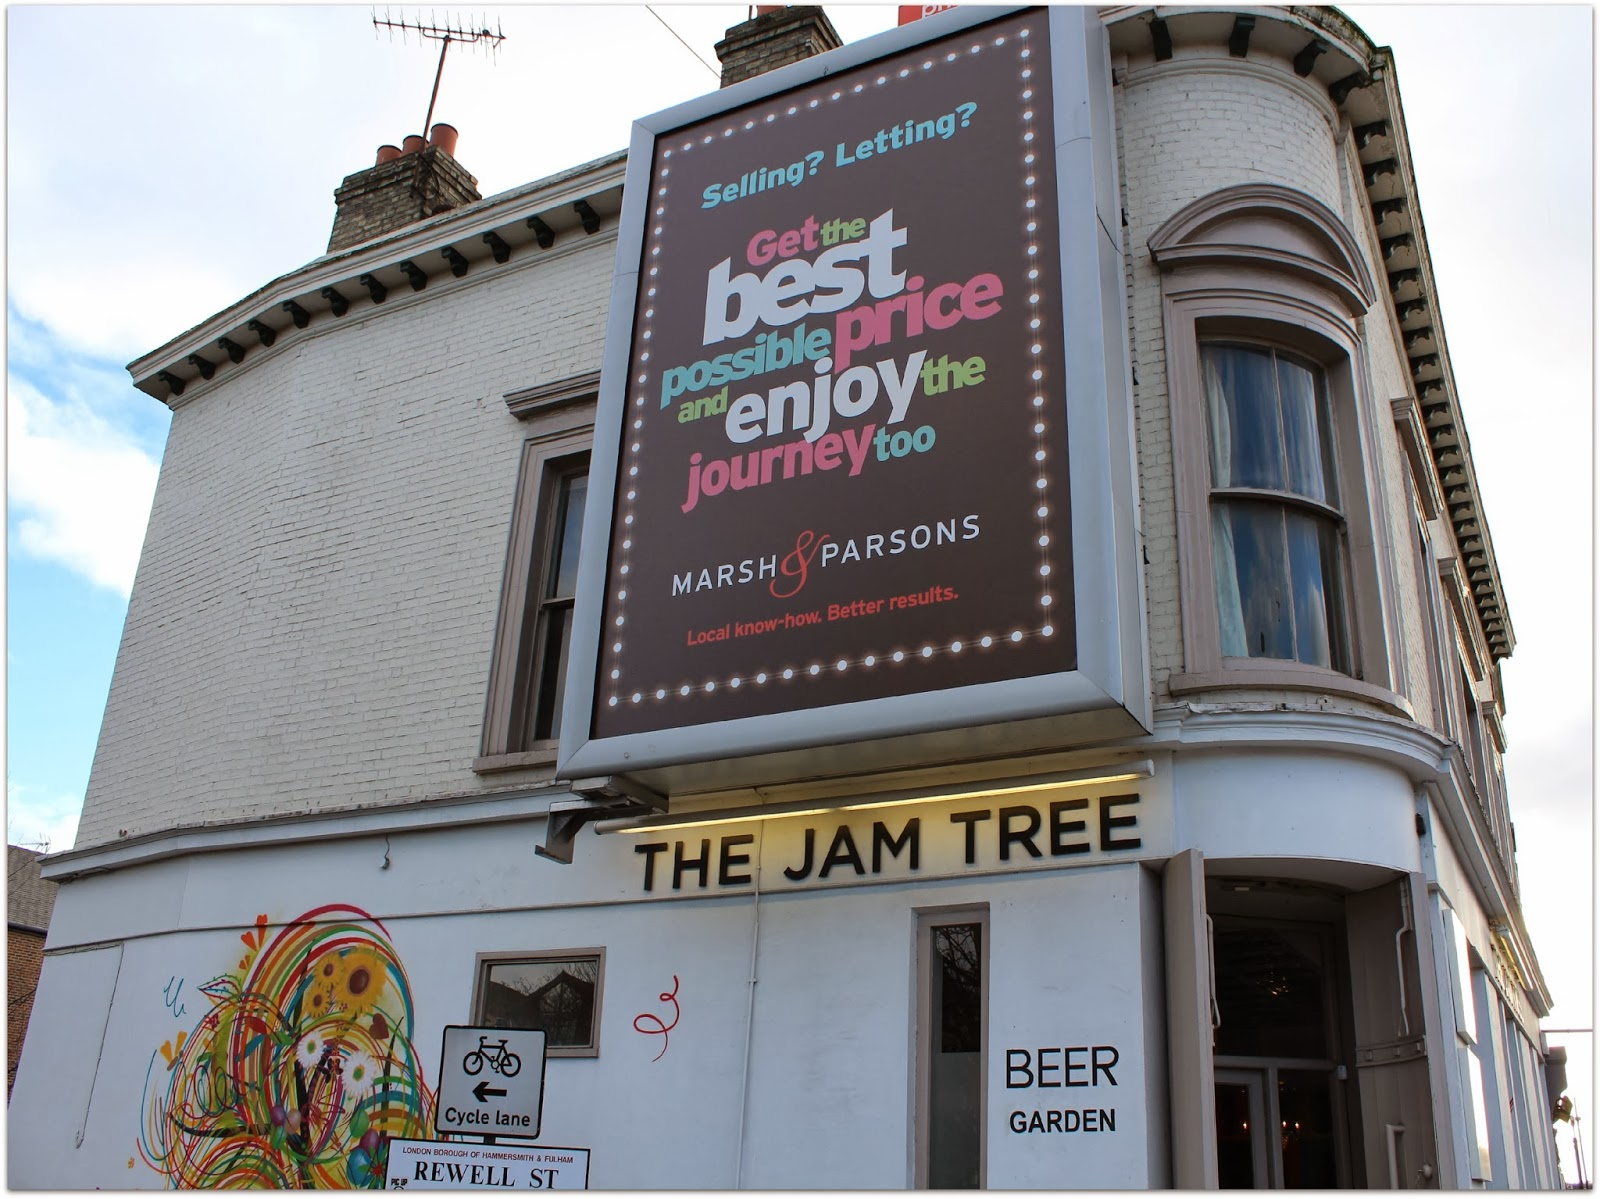 The Jam Tree